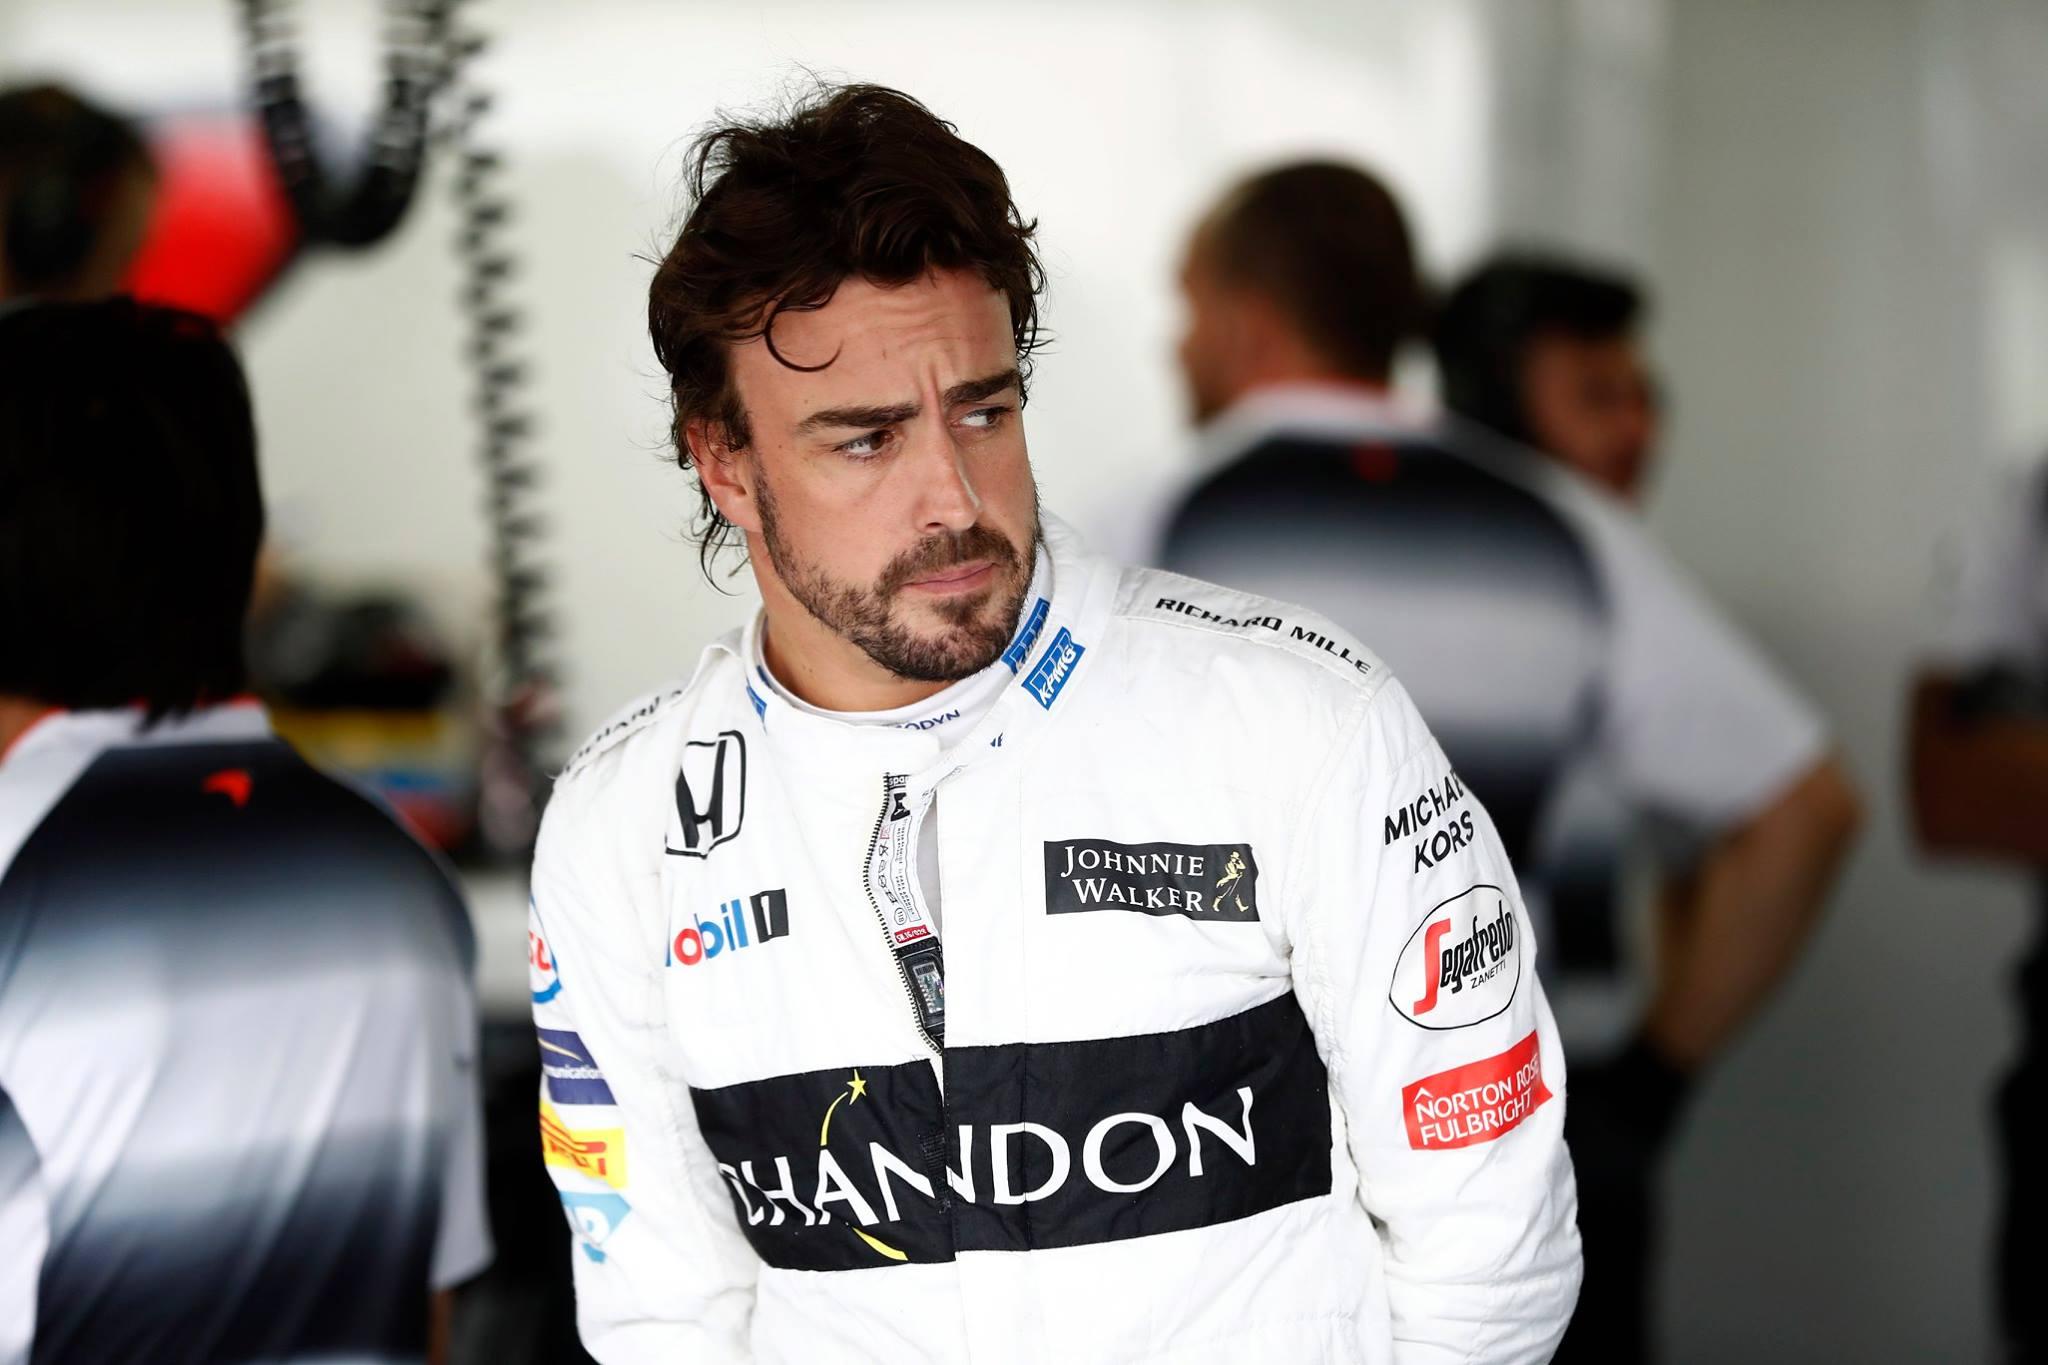 Alonso_V6_McLaren_Honda_F1_Spa_2016